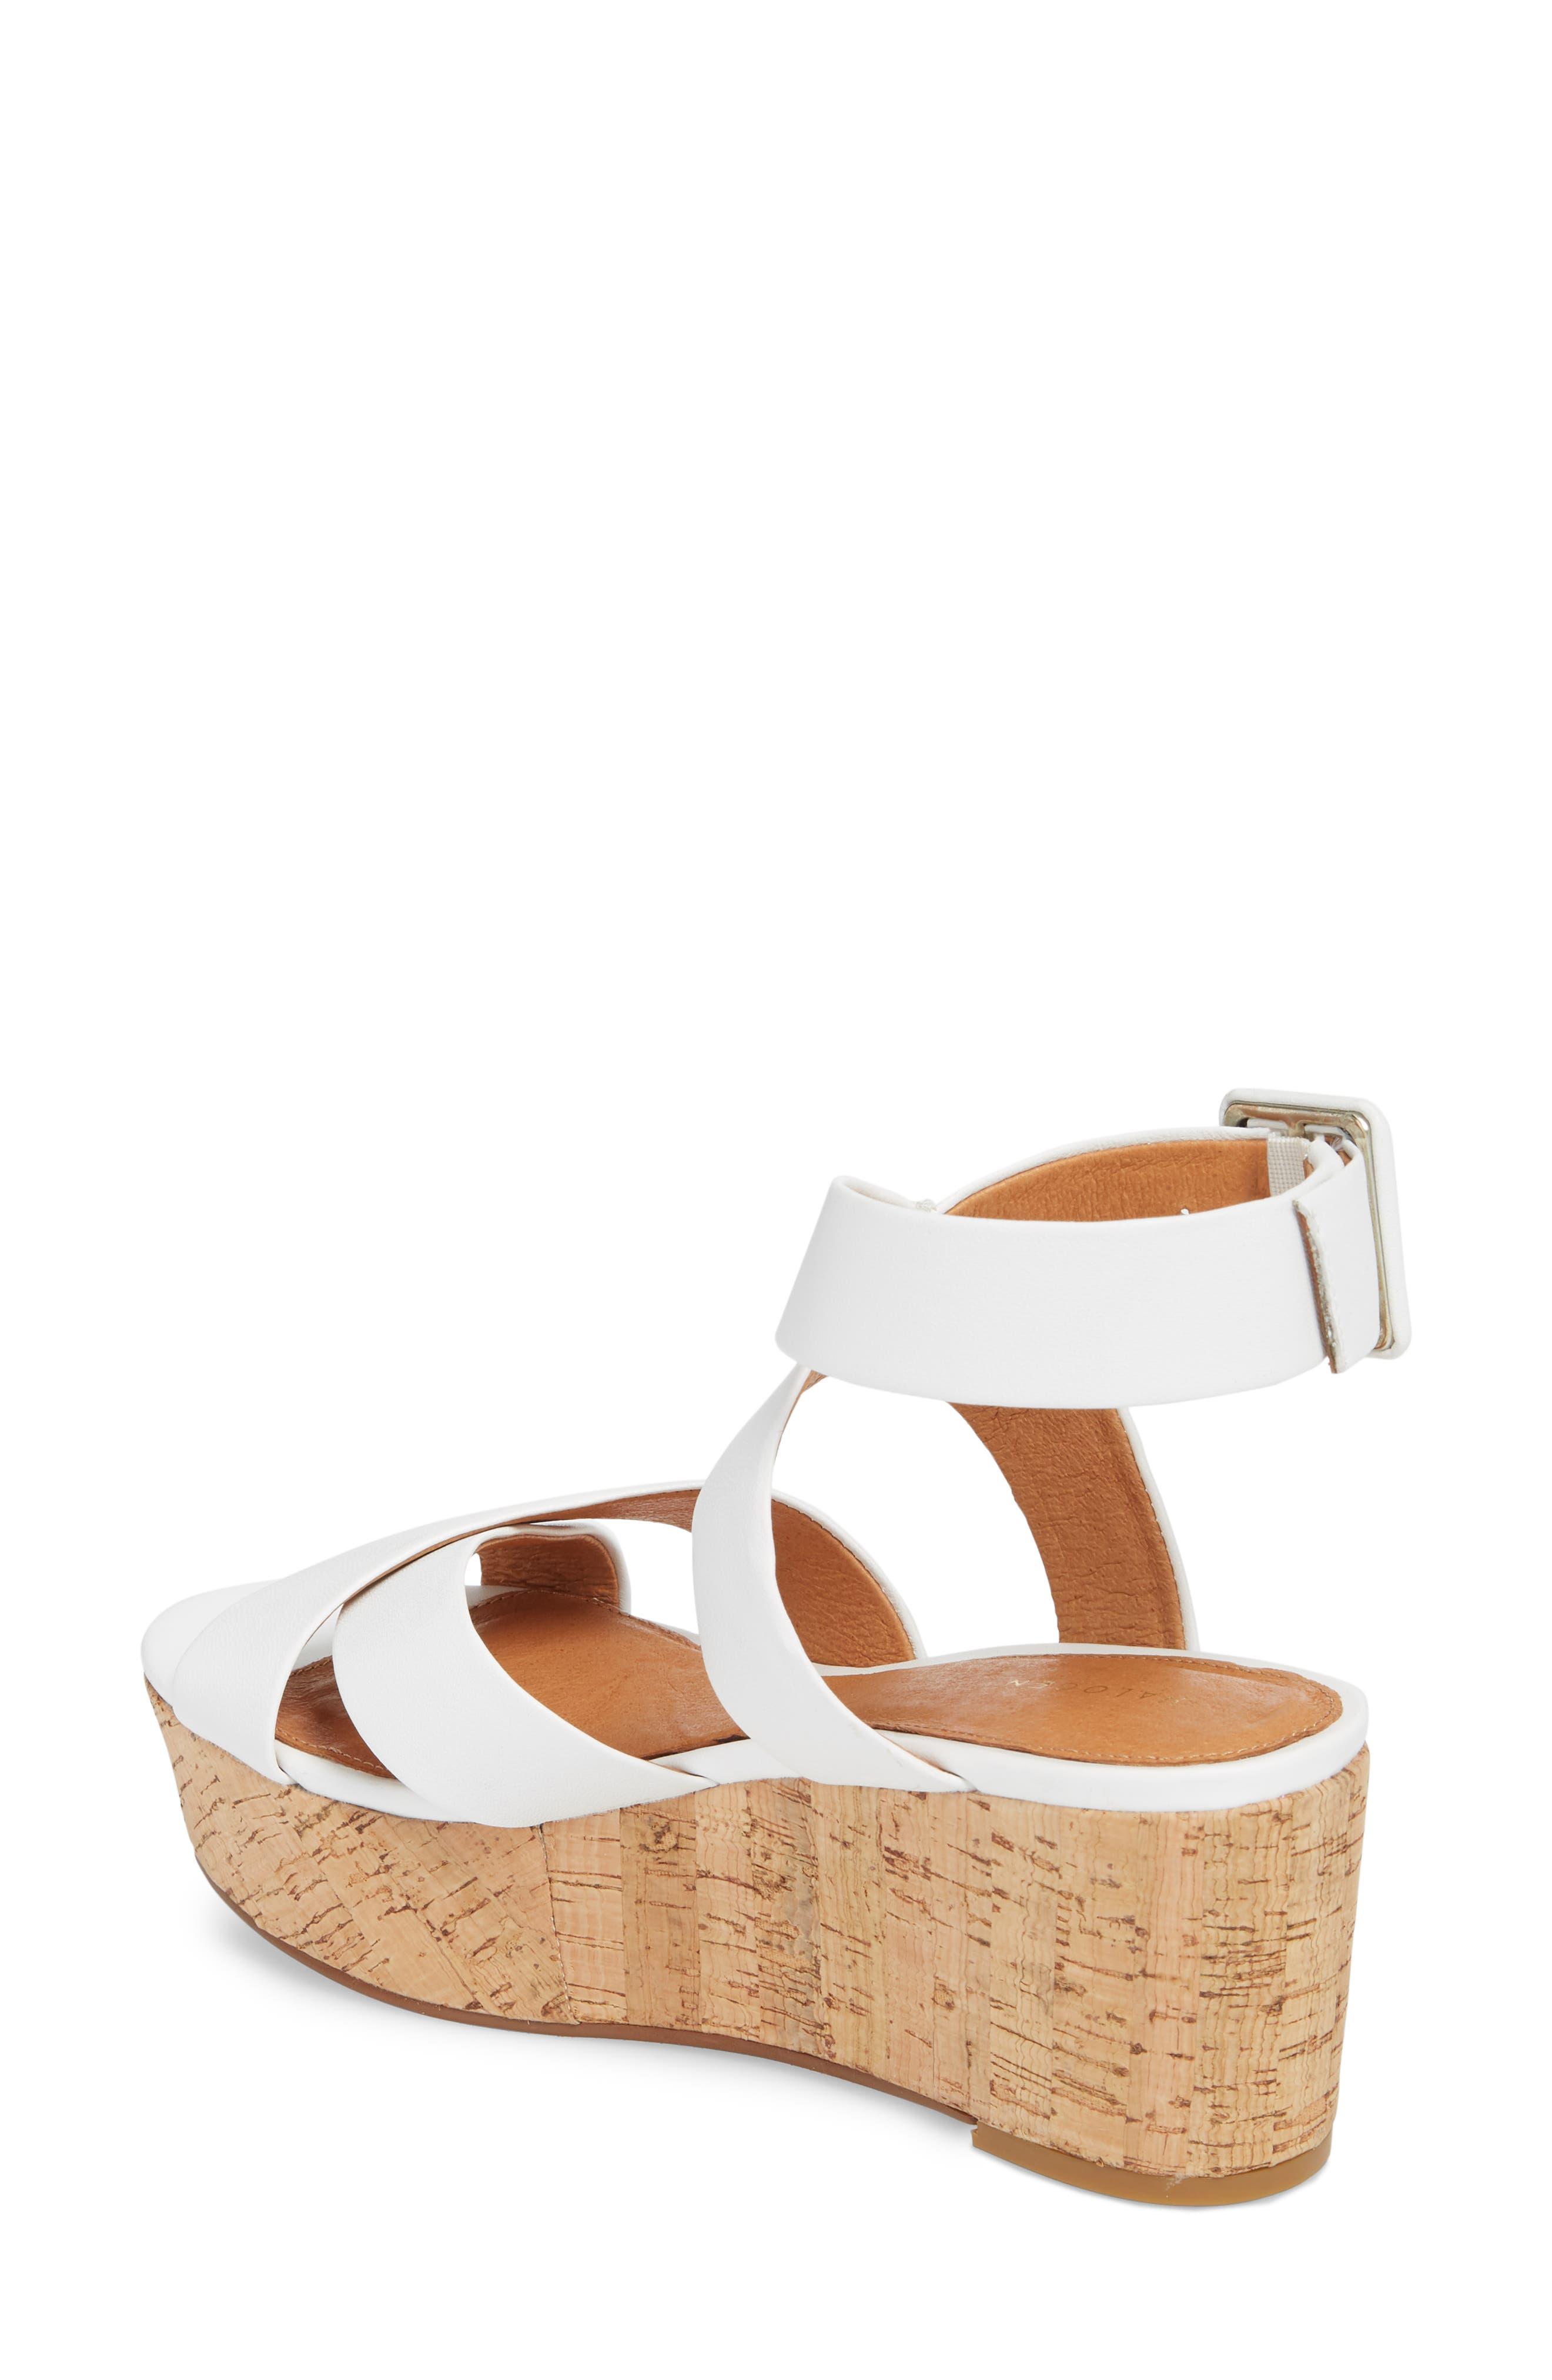 Evie Platform Wedge Sandal,                             Alternate thumbnail 4, color,